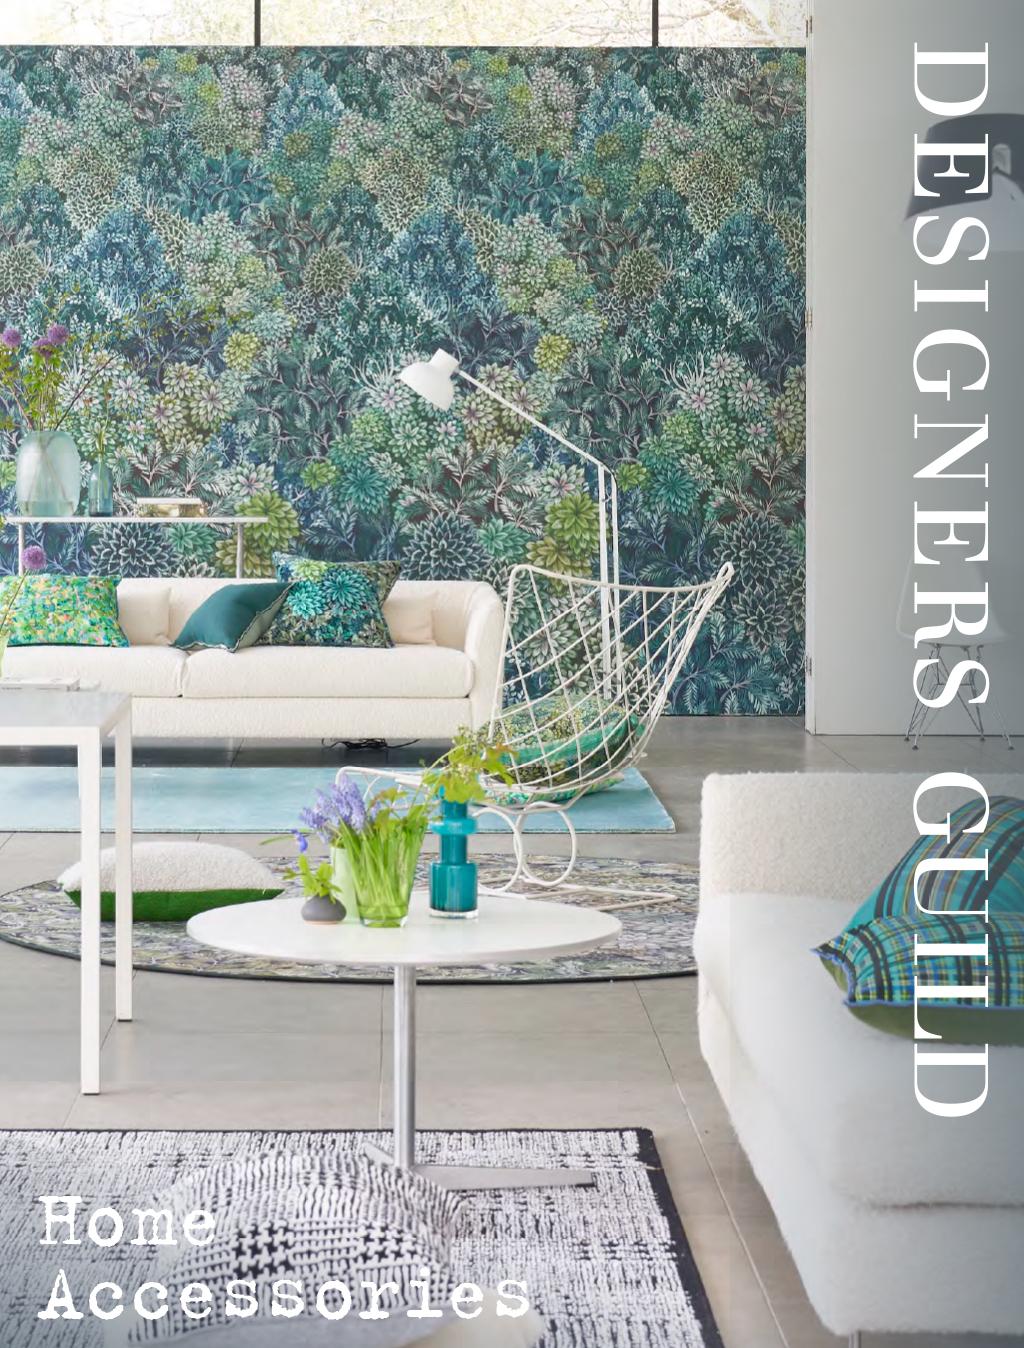 DESIGNERS GUILD HOME ACCESSORIES AUTUMN/WINTER 2021